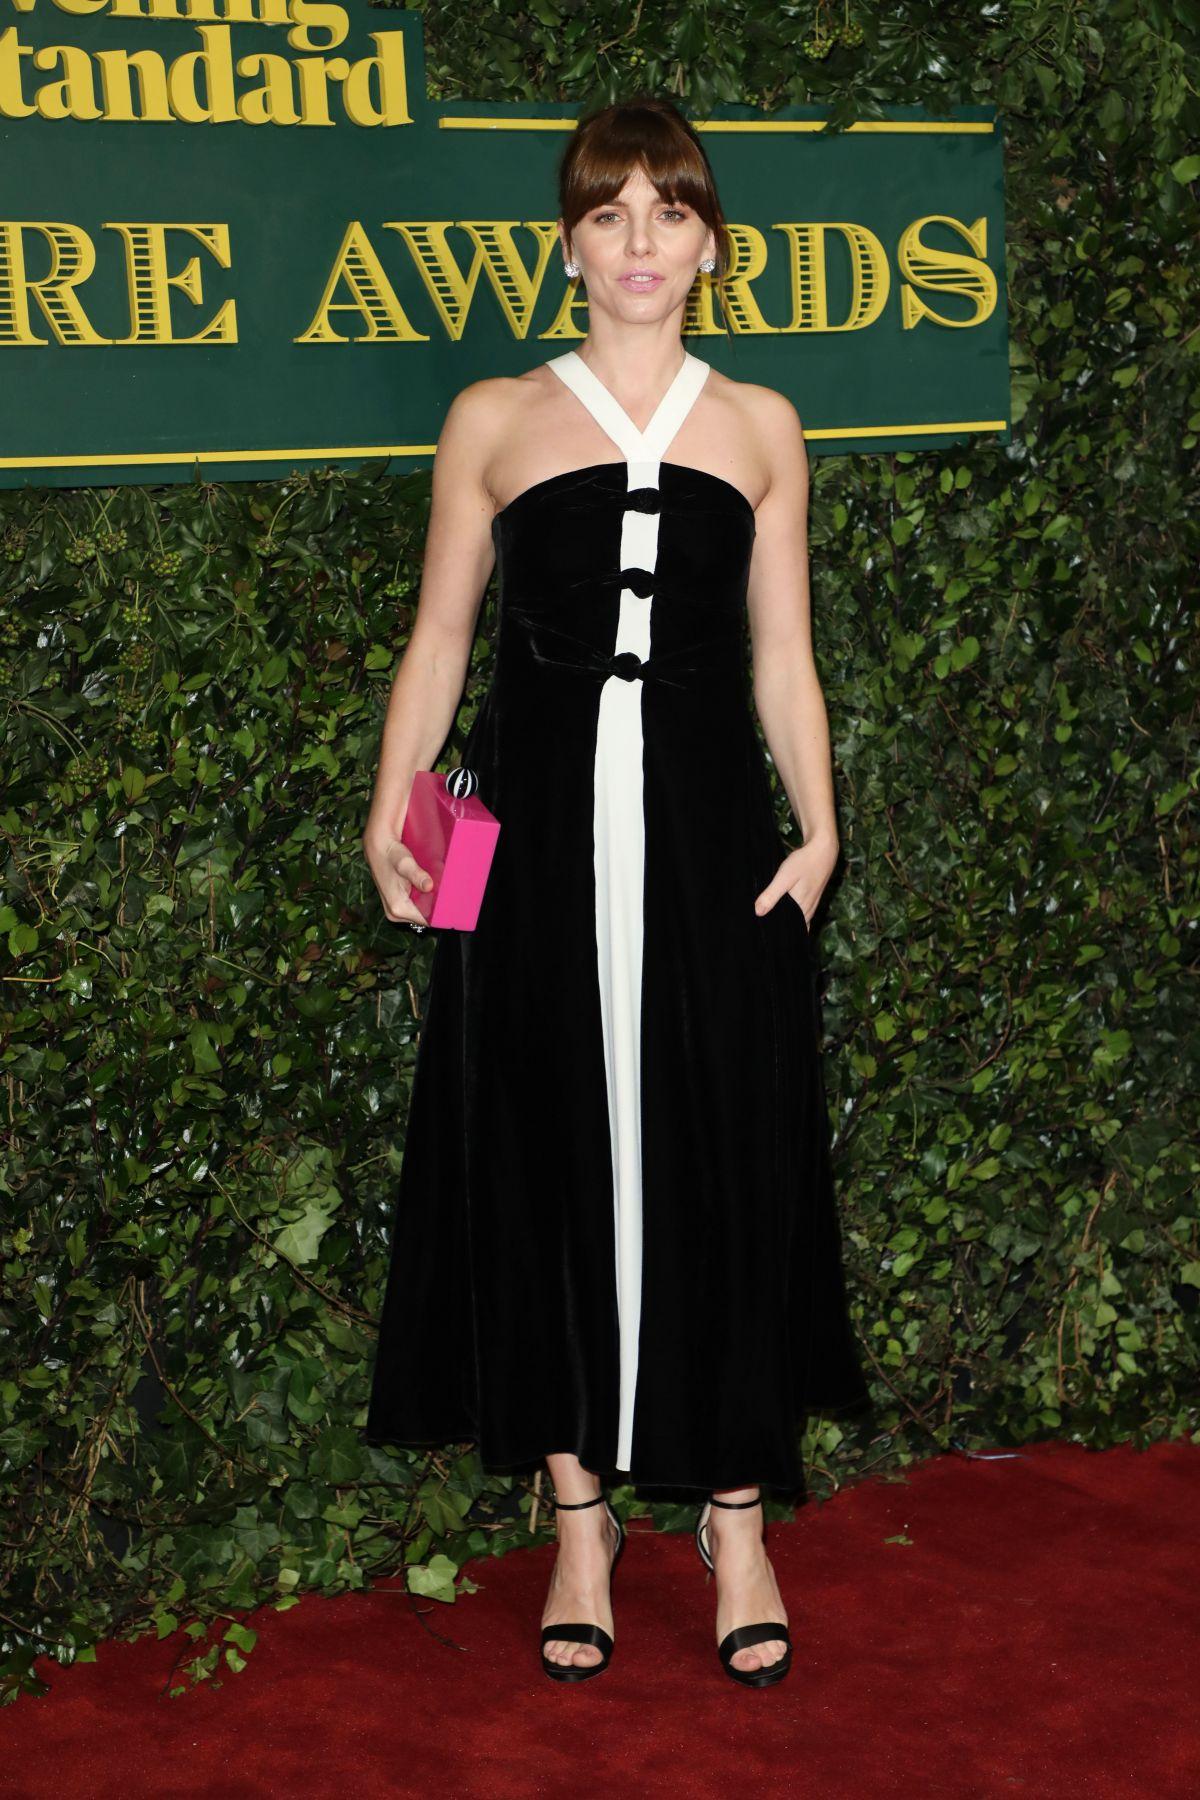 OPHELIA LOVIBOND at London Evening Standard Theatre Awards ...